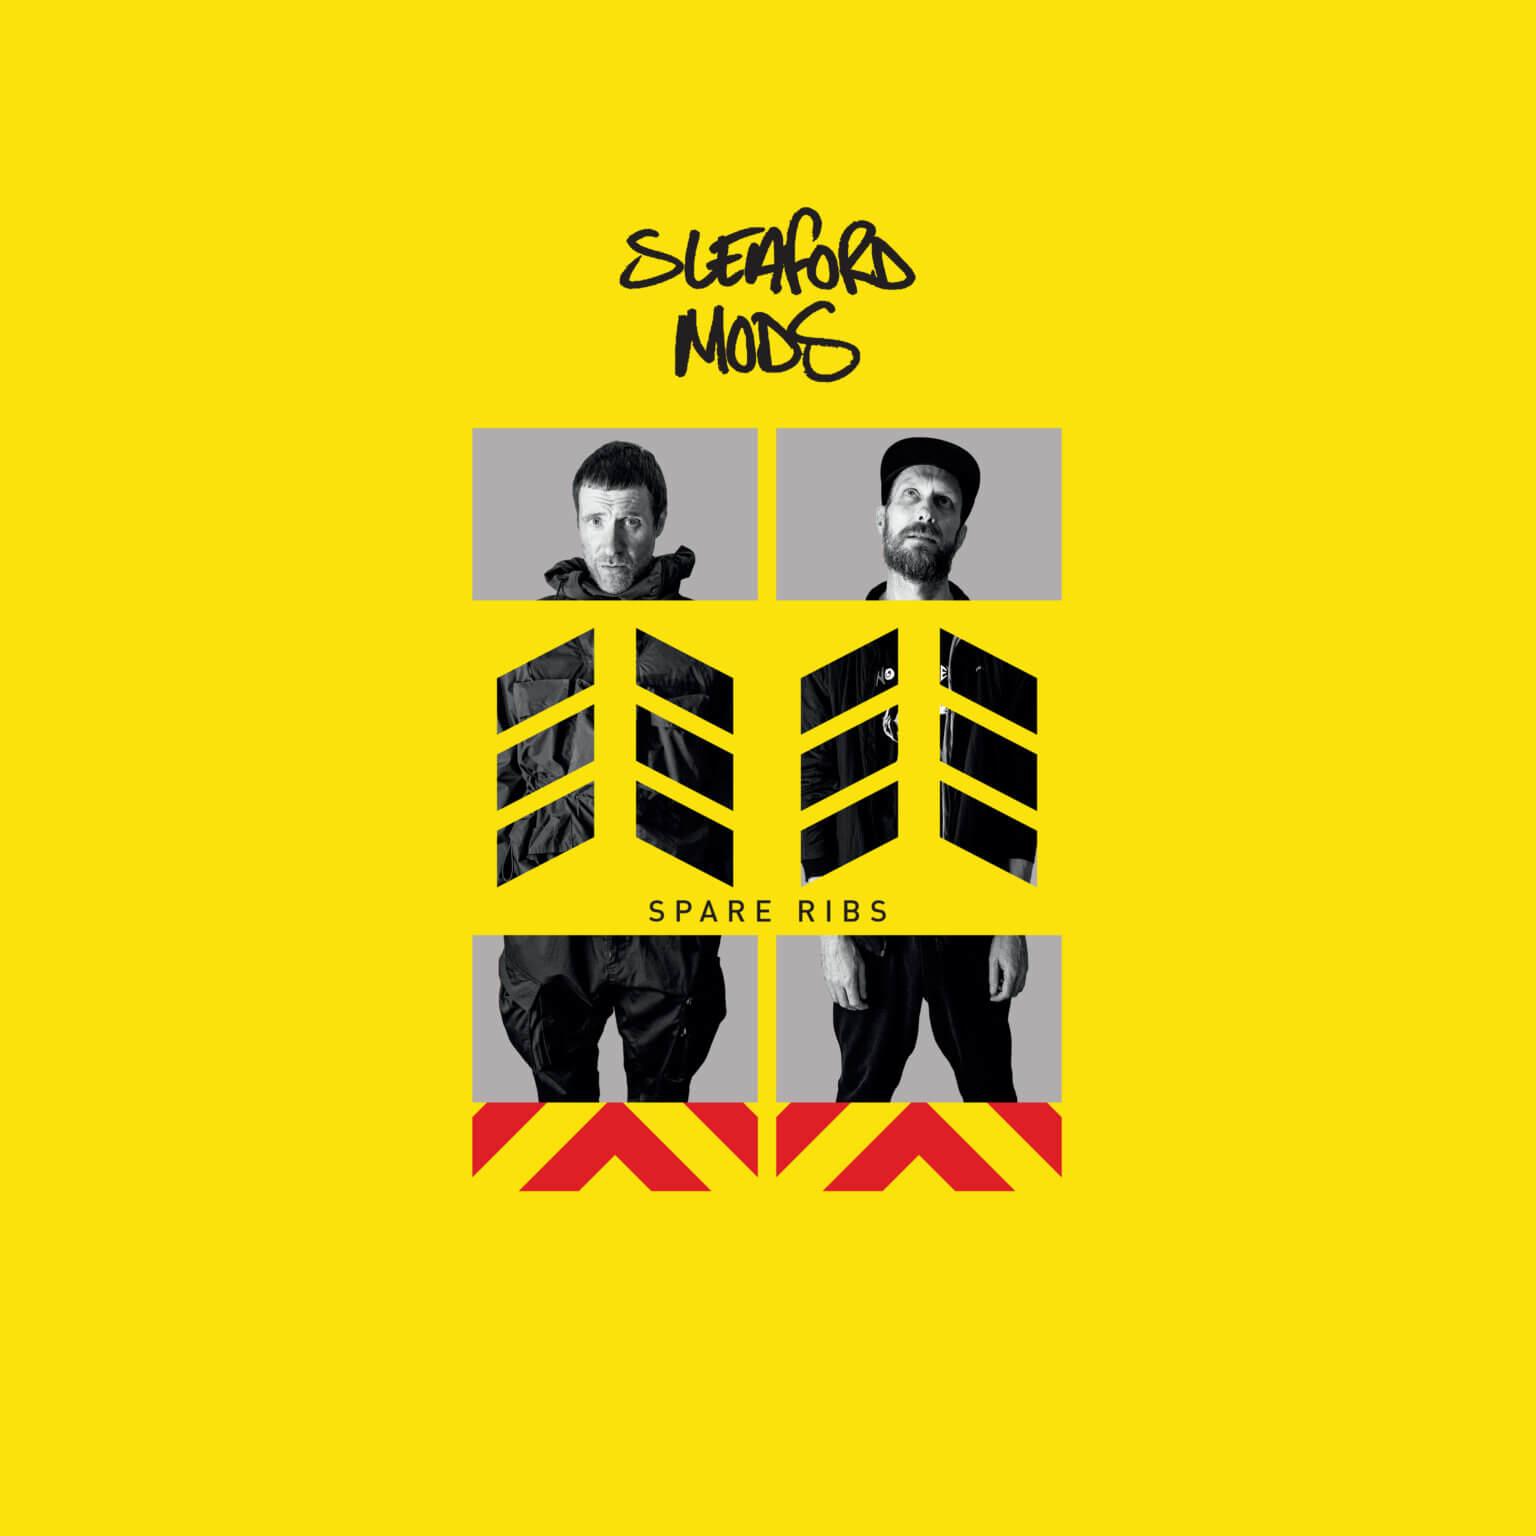 Sleaford Mods : Premier single, prochain album ! - VisualMusic